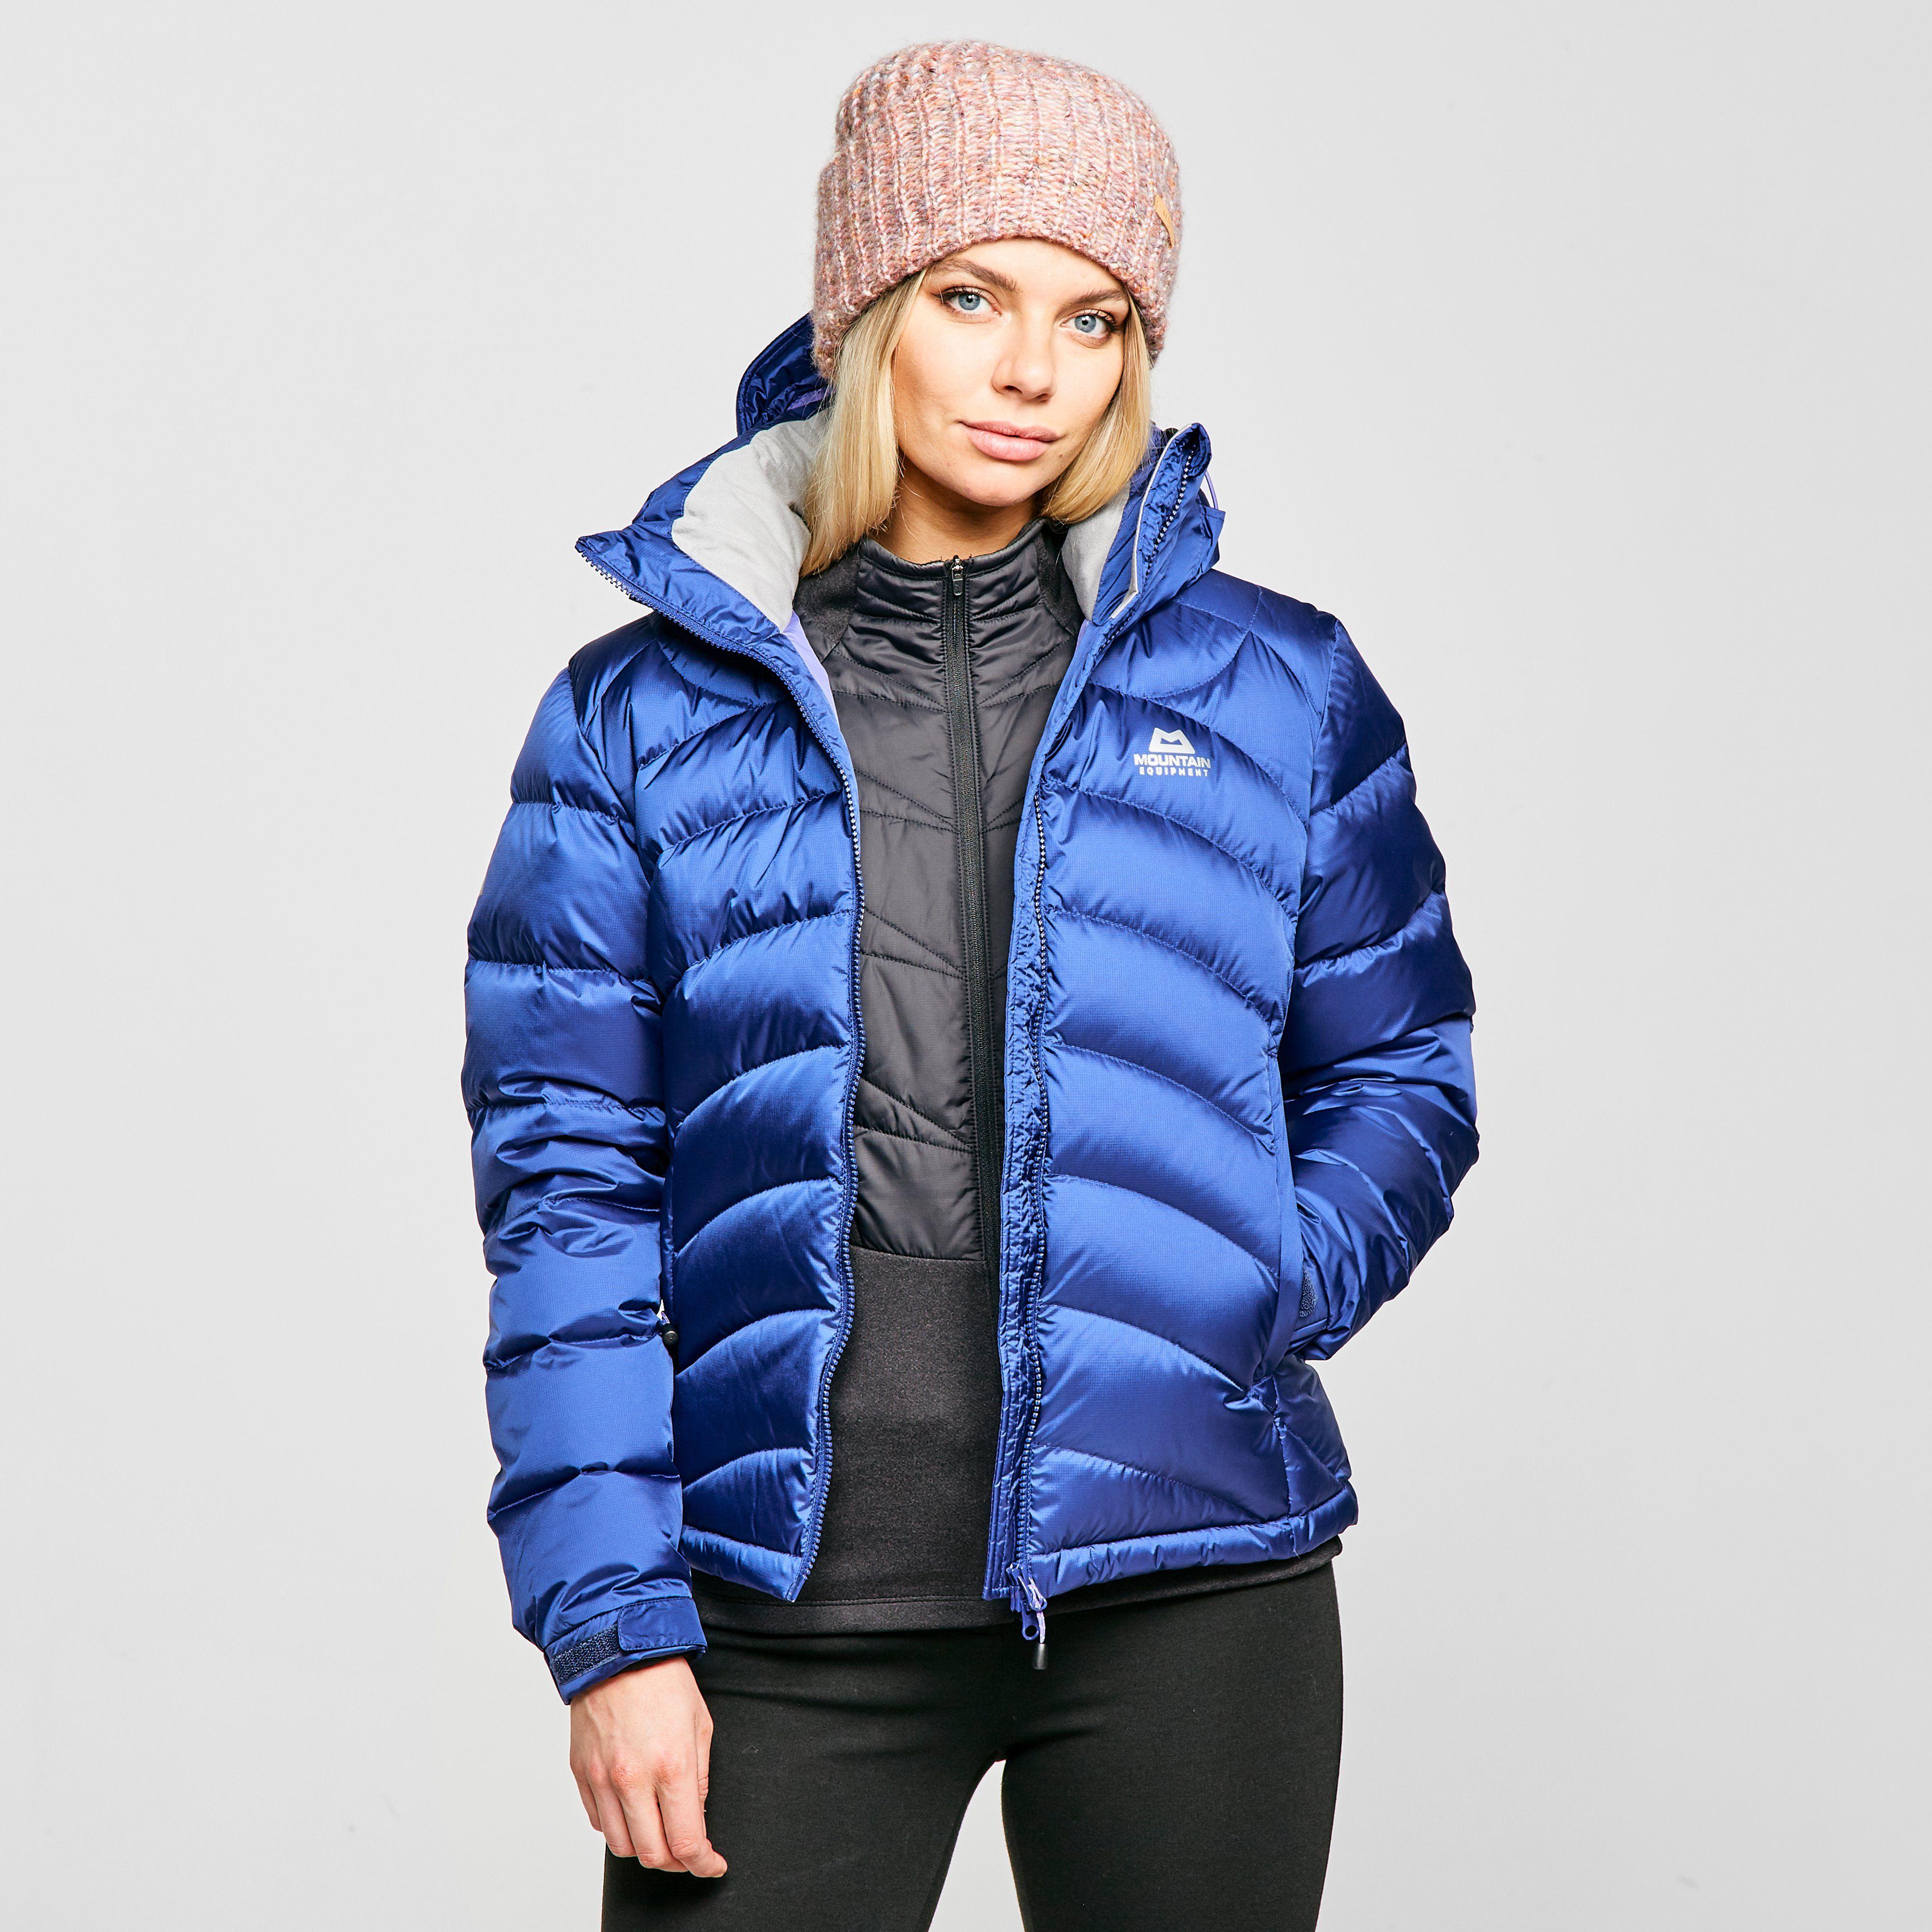 MOUNTAIN EQUIPMENT Women's Lightline Down Jacket